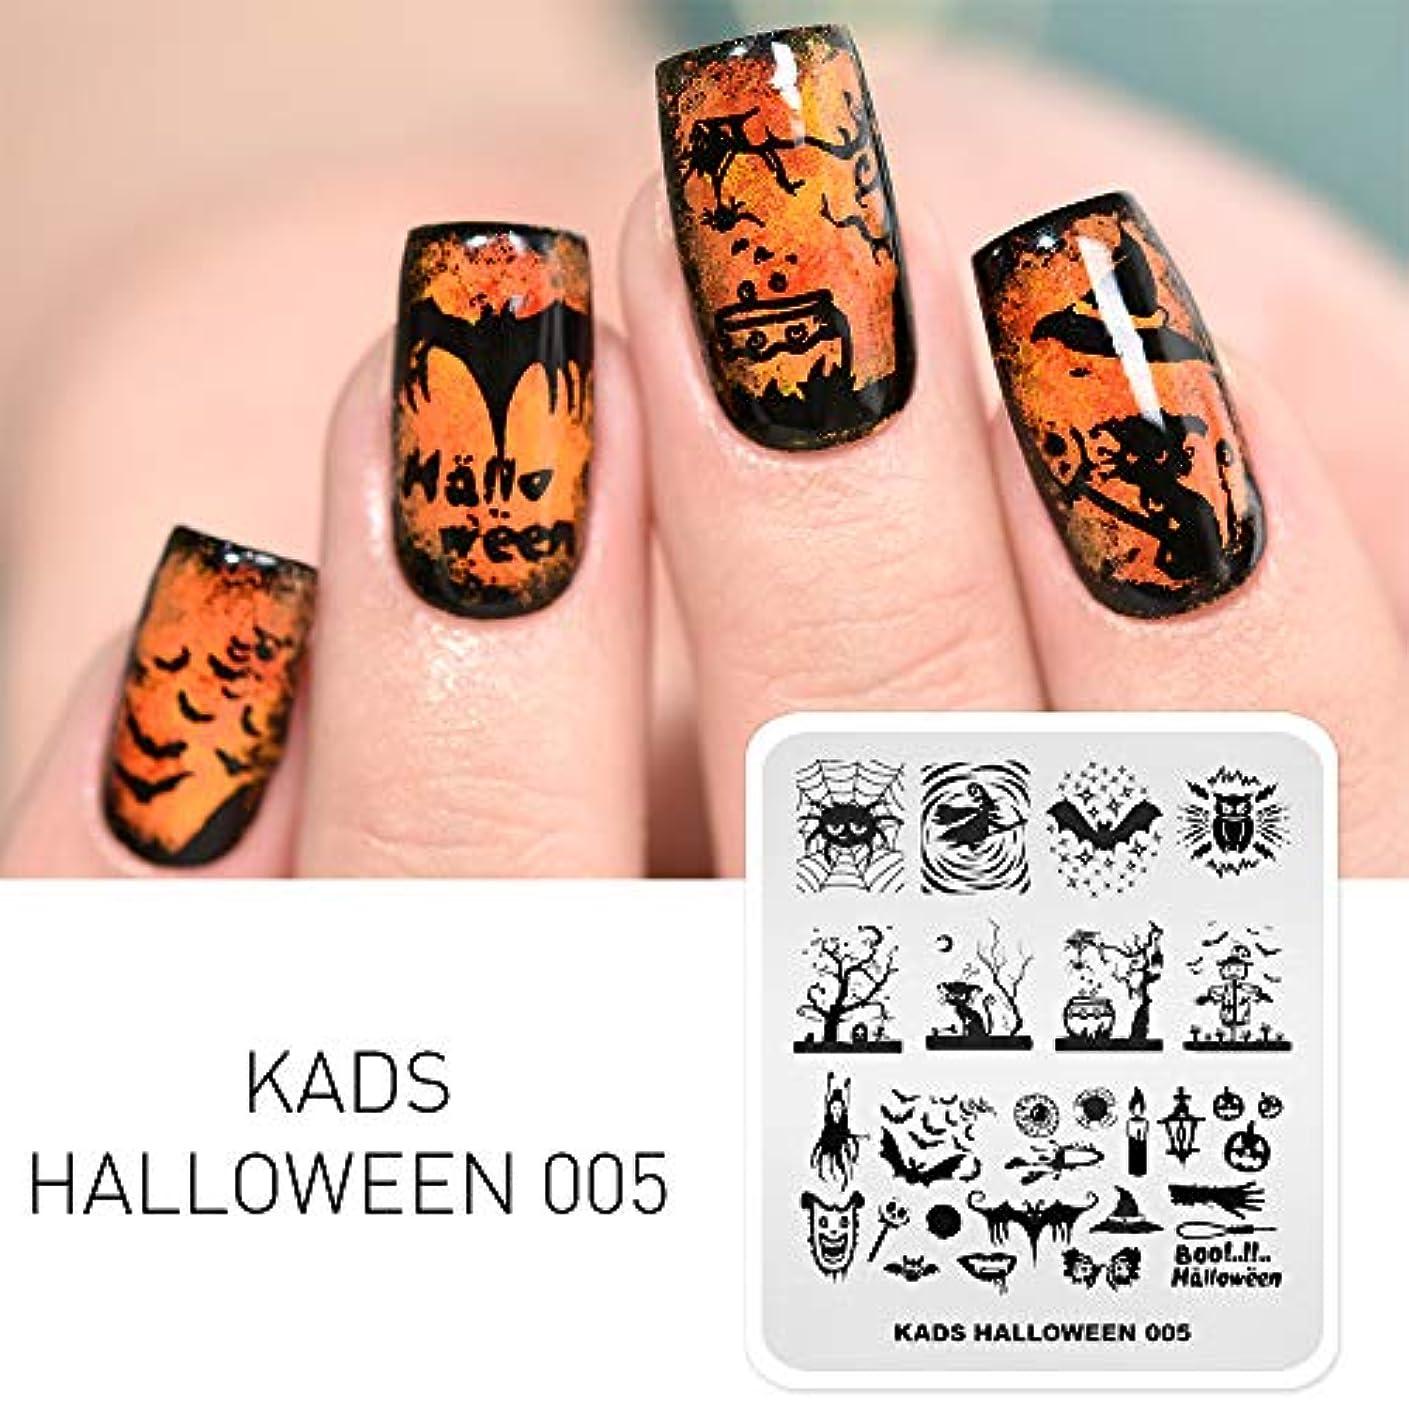 KADS ハロウィン スタンプネイルプレート 蜘蛛 バット ネイルスタンピングプレート ネイルステンシル ネイルアート道具 (HA005)